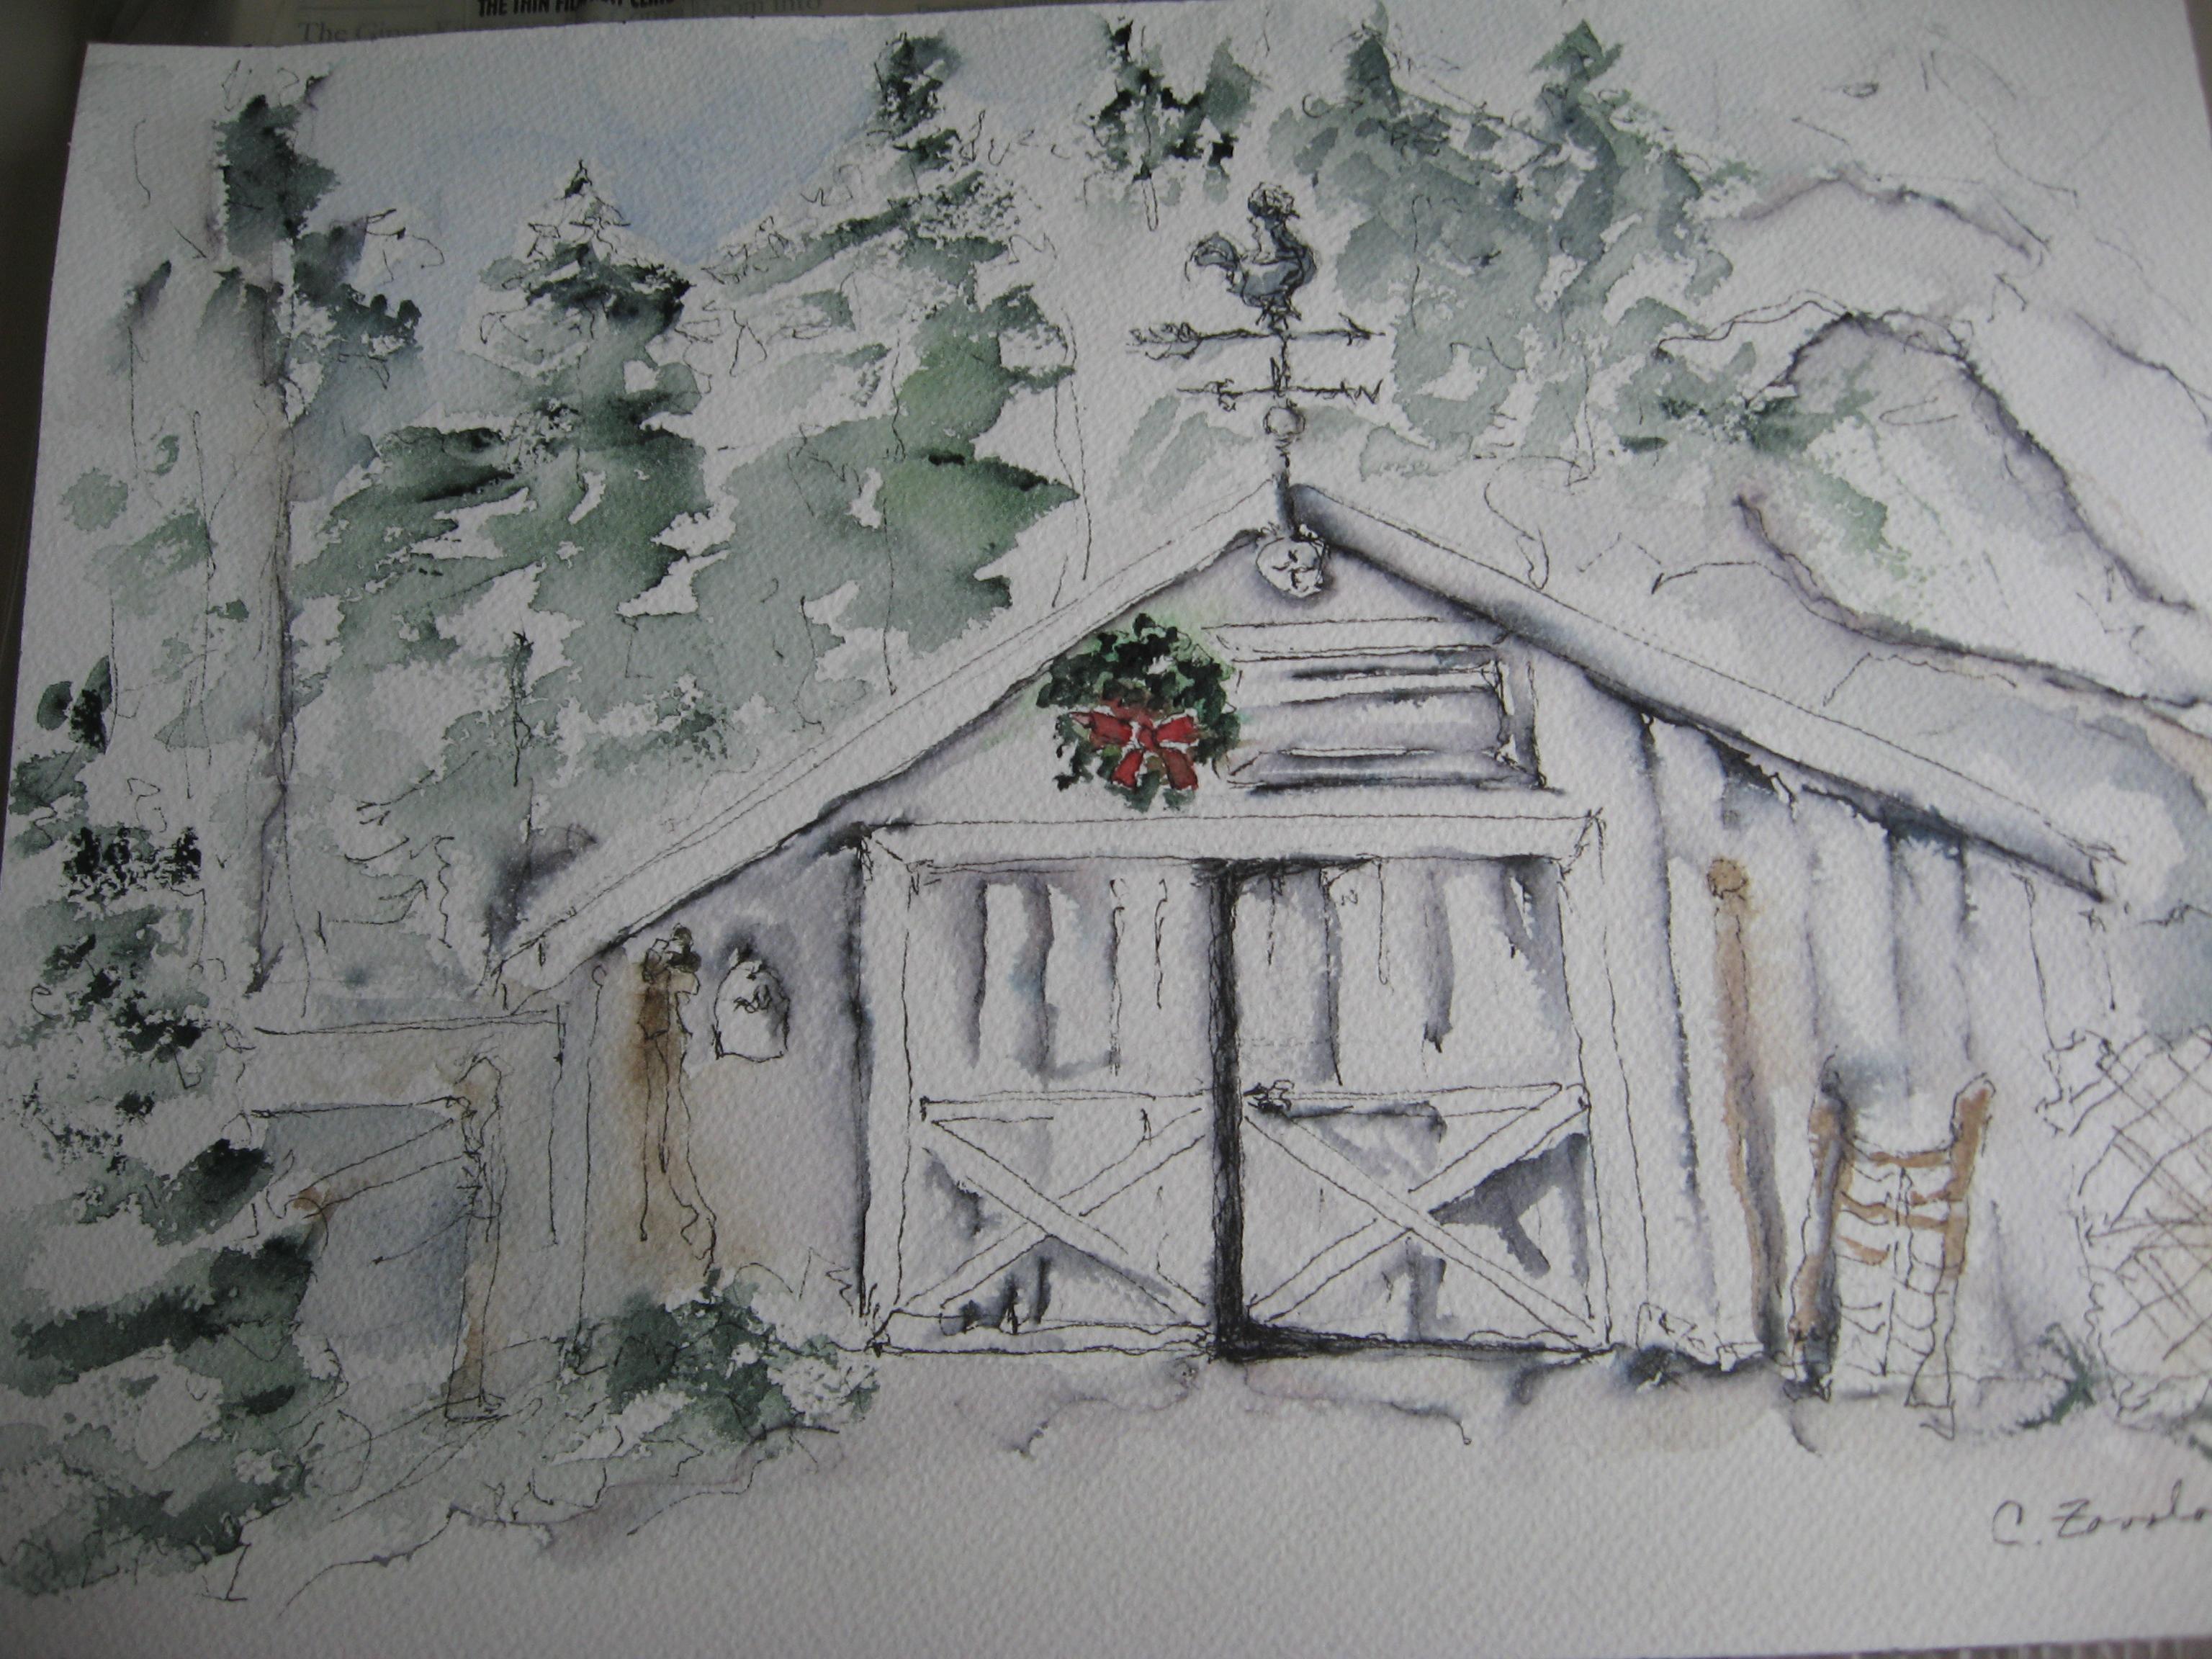 Marc's Snowy Barn - Woodinville, WA